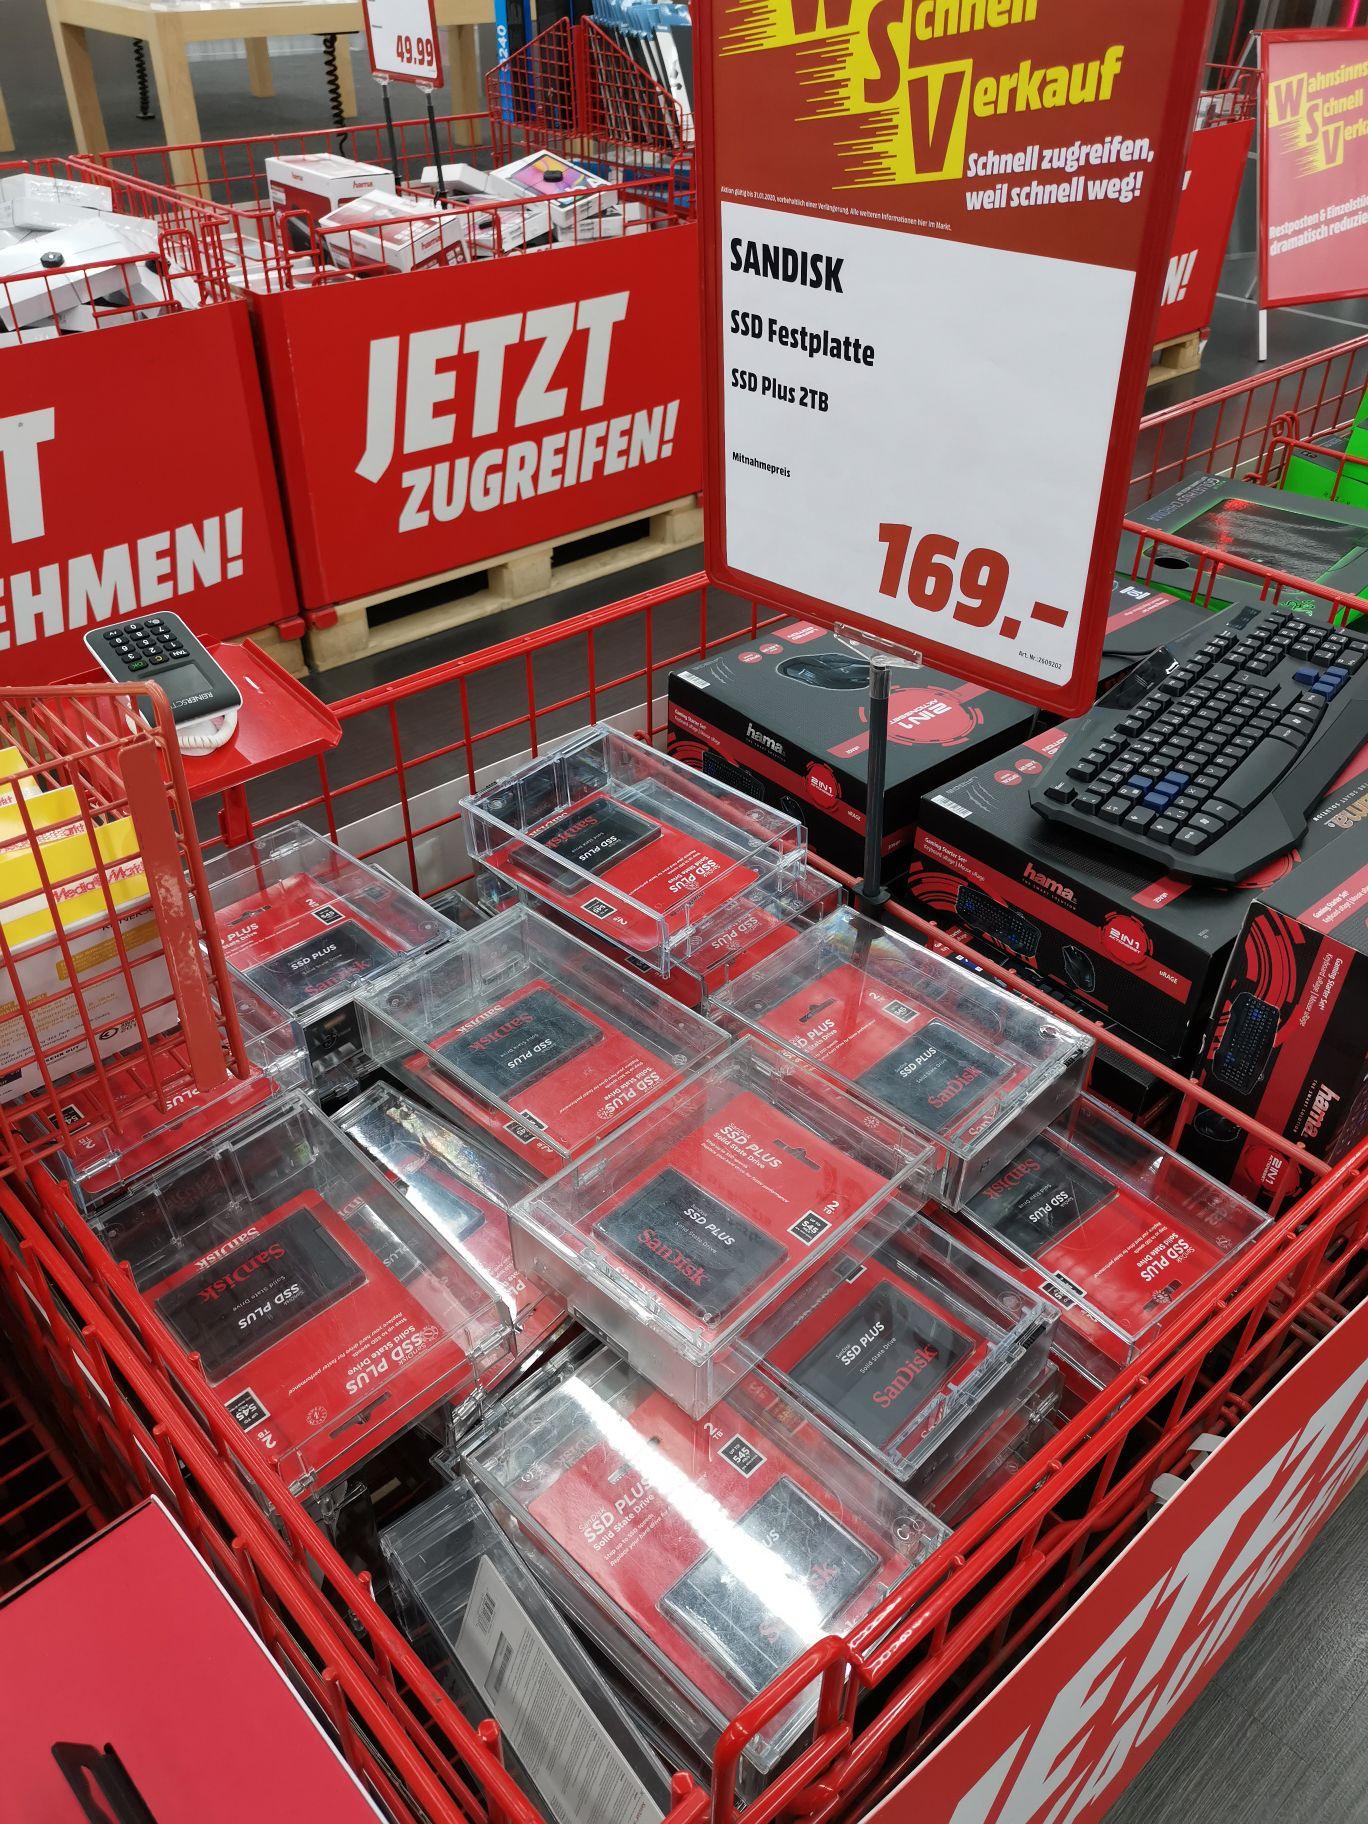 [Lokal] SSD SanDisk Plus 2 TB Media Markt Berlin Alexa